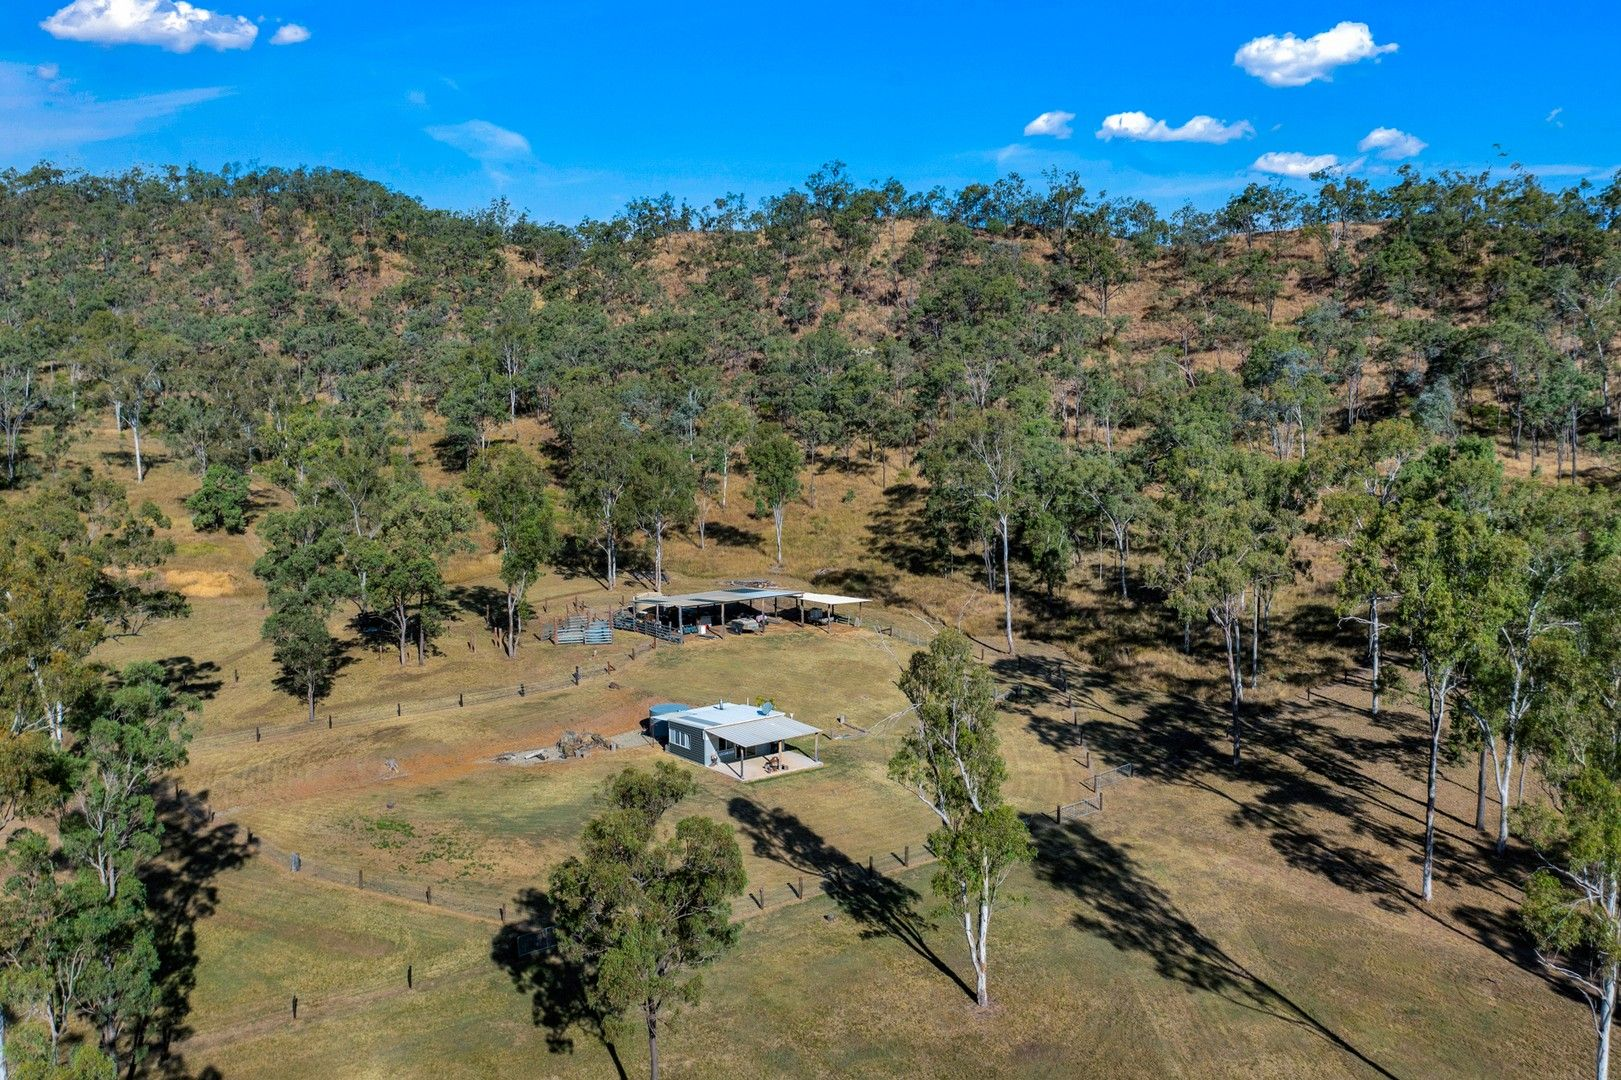 Lot 1 - 10 Blacksnake Road, Black Snake QLD 4600, Image 0